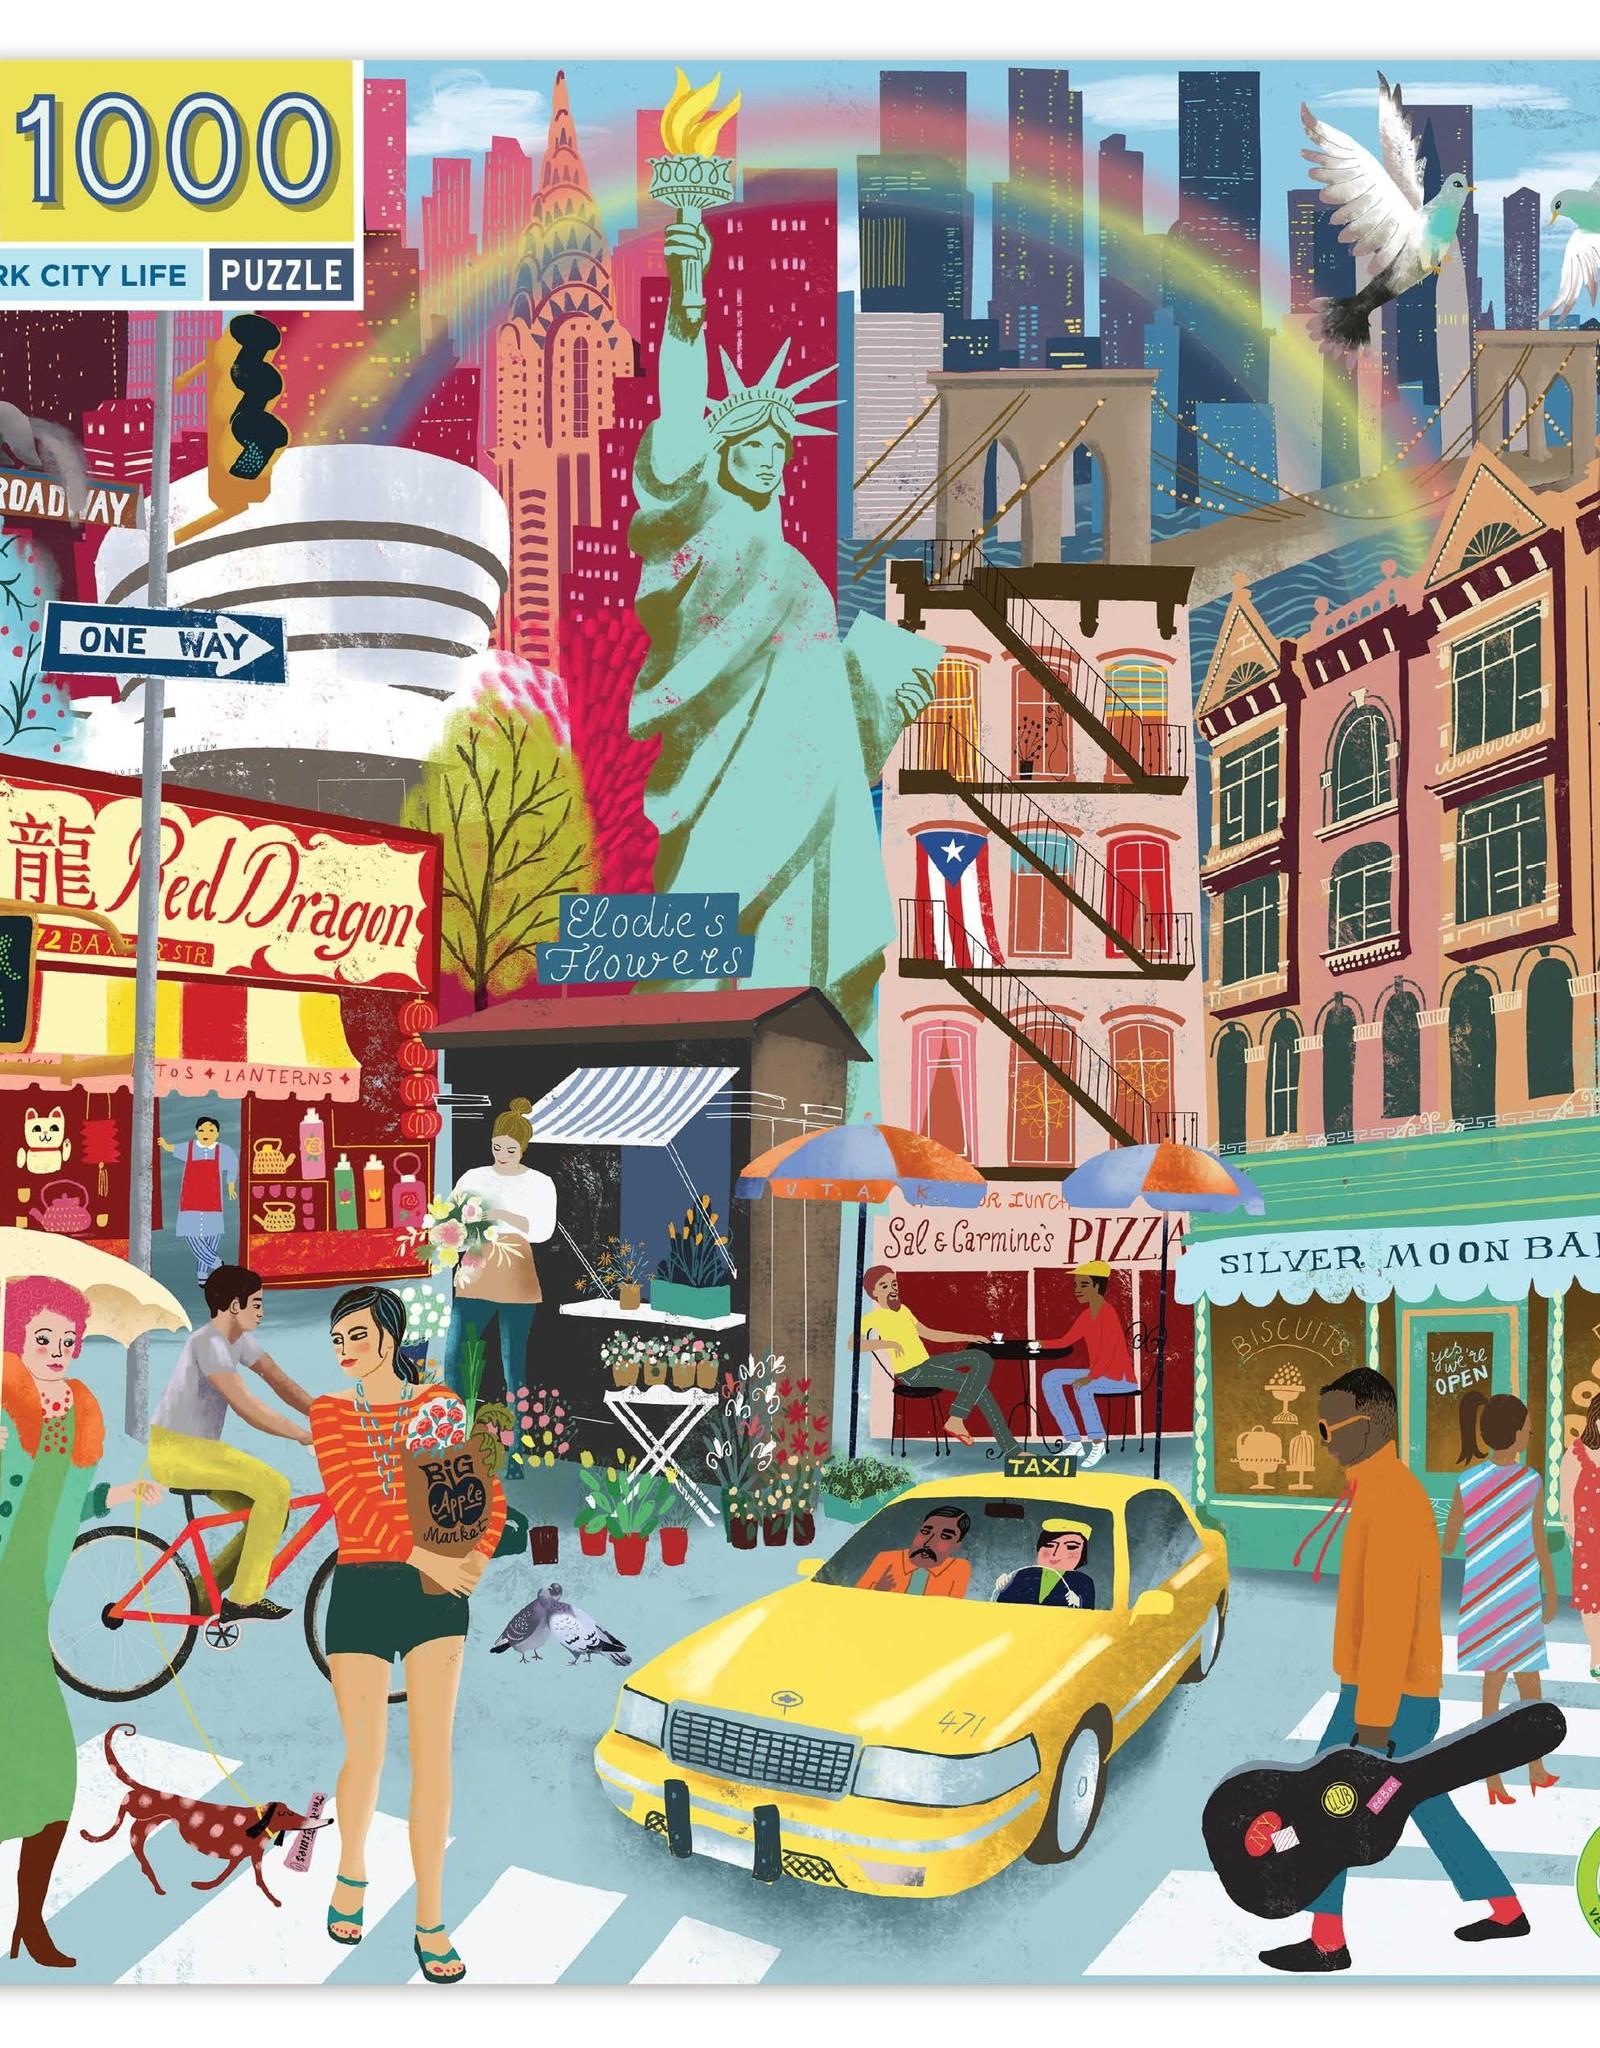 Puzzle 1000 piece: New York City Life